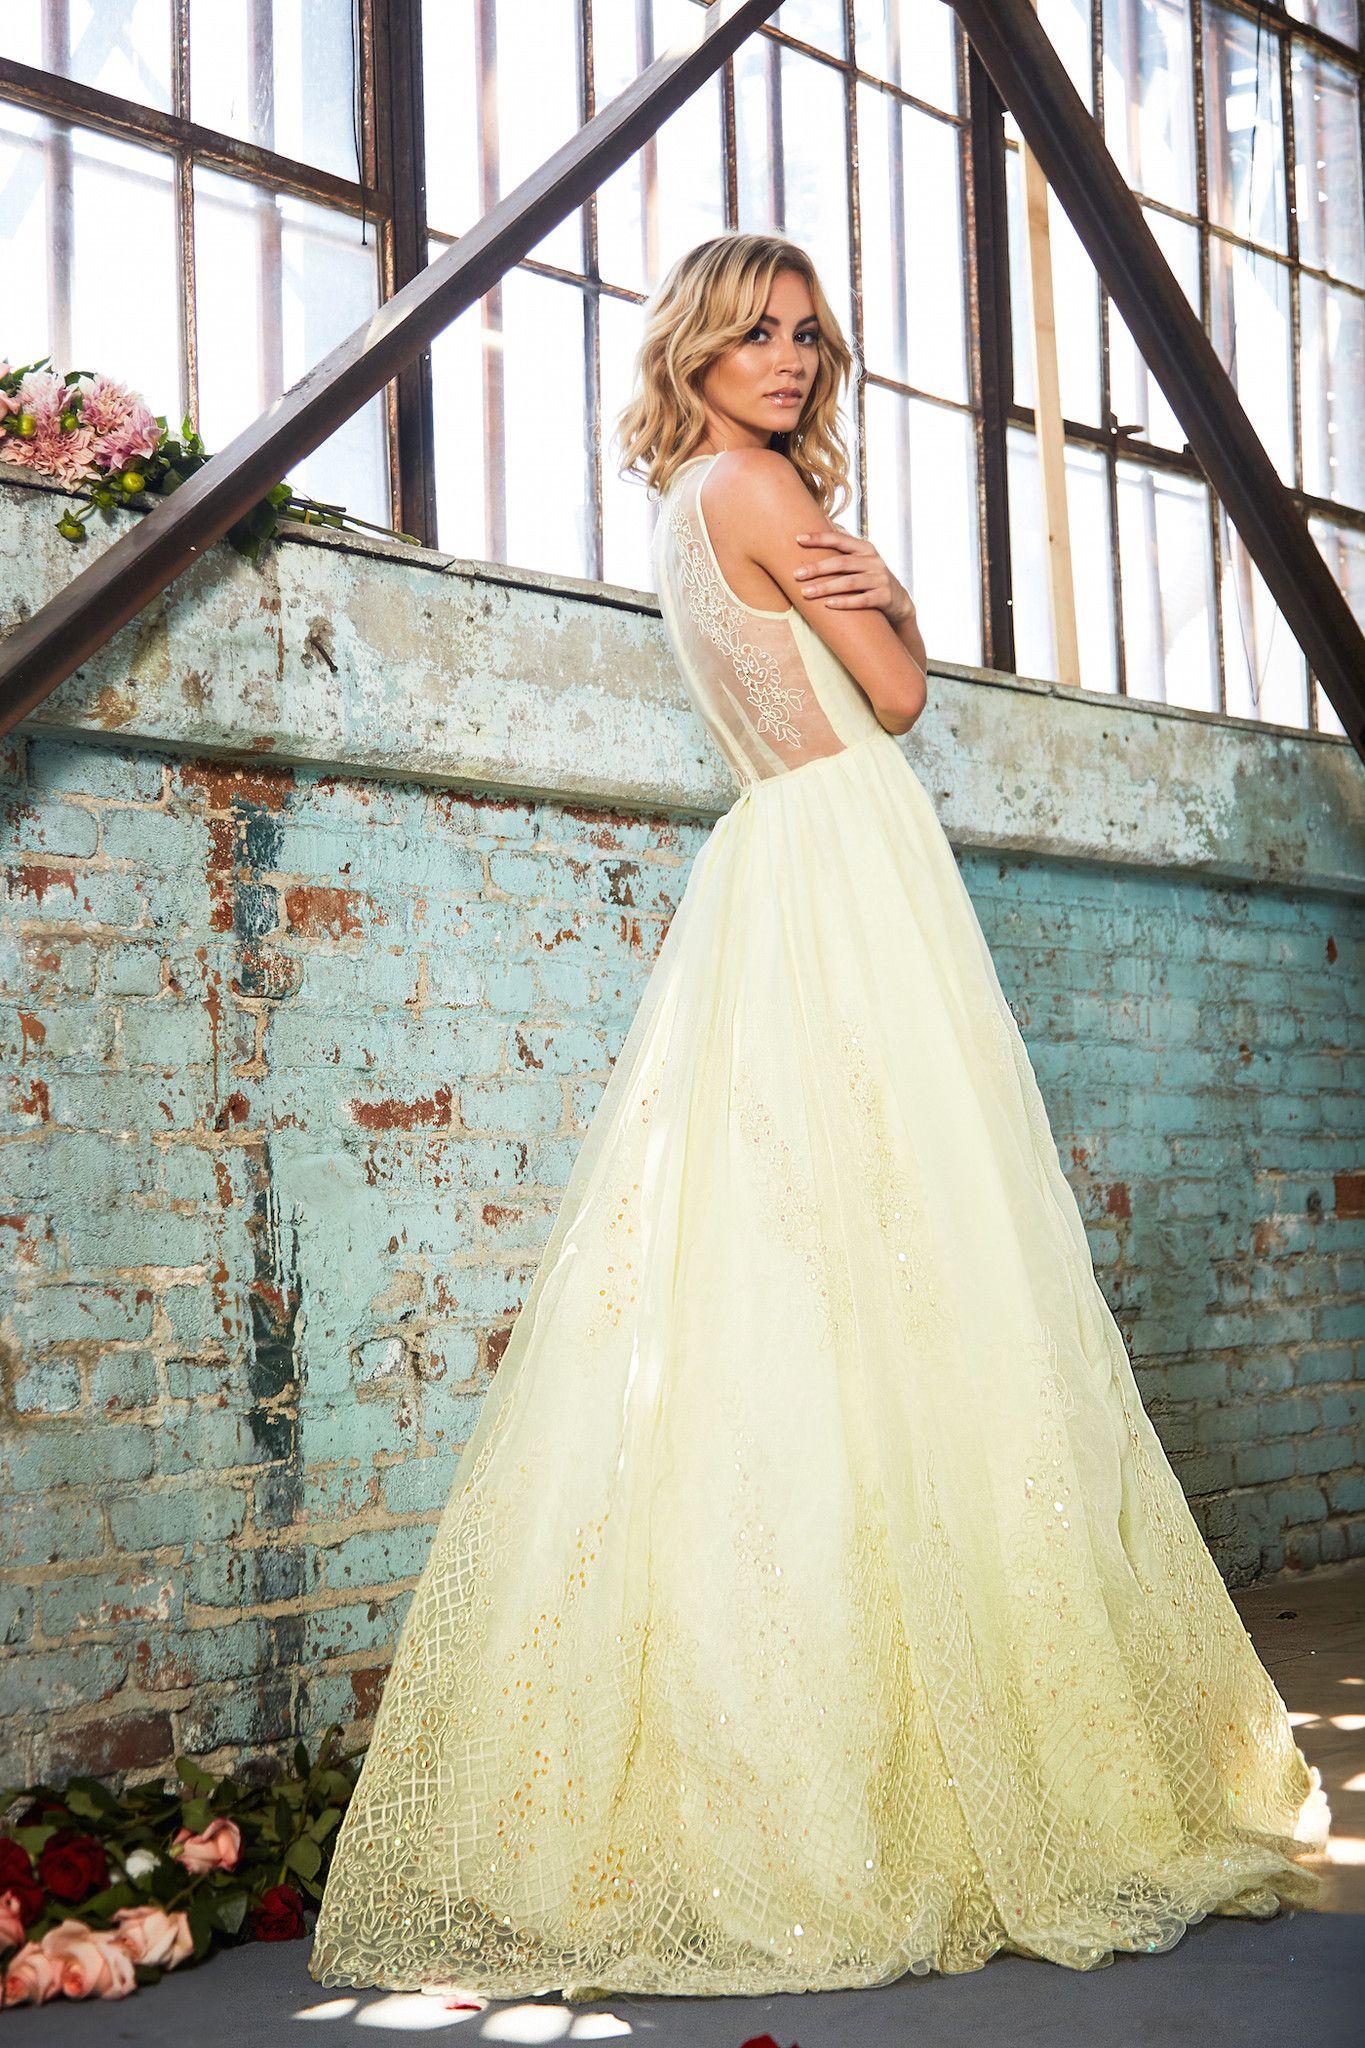 Yellow wedding dress - Lurelly Bridal Wedding Dress | fabmood.com